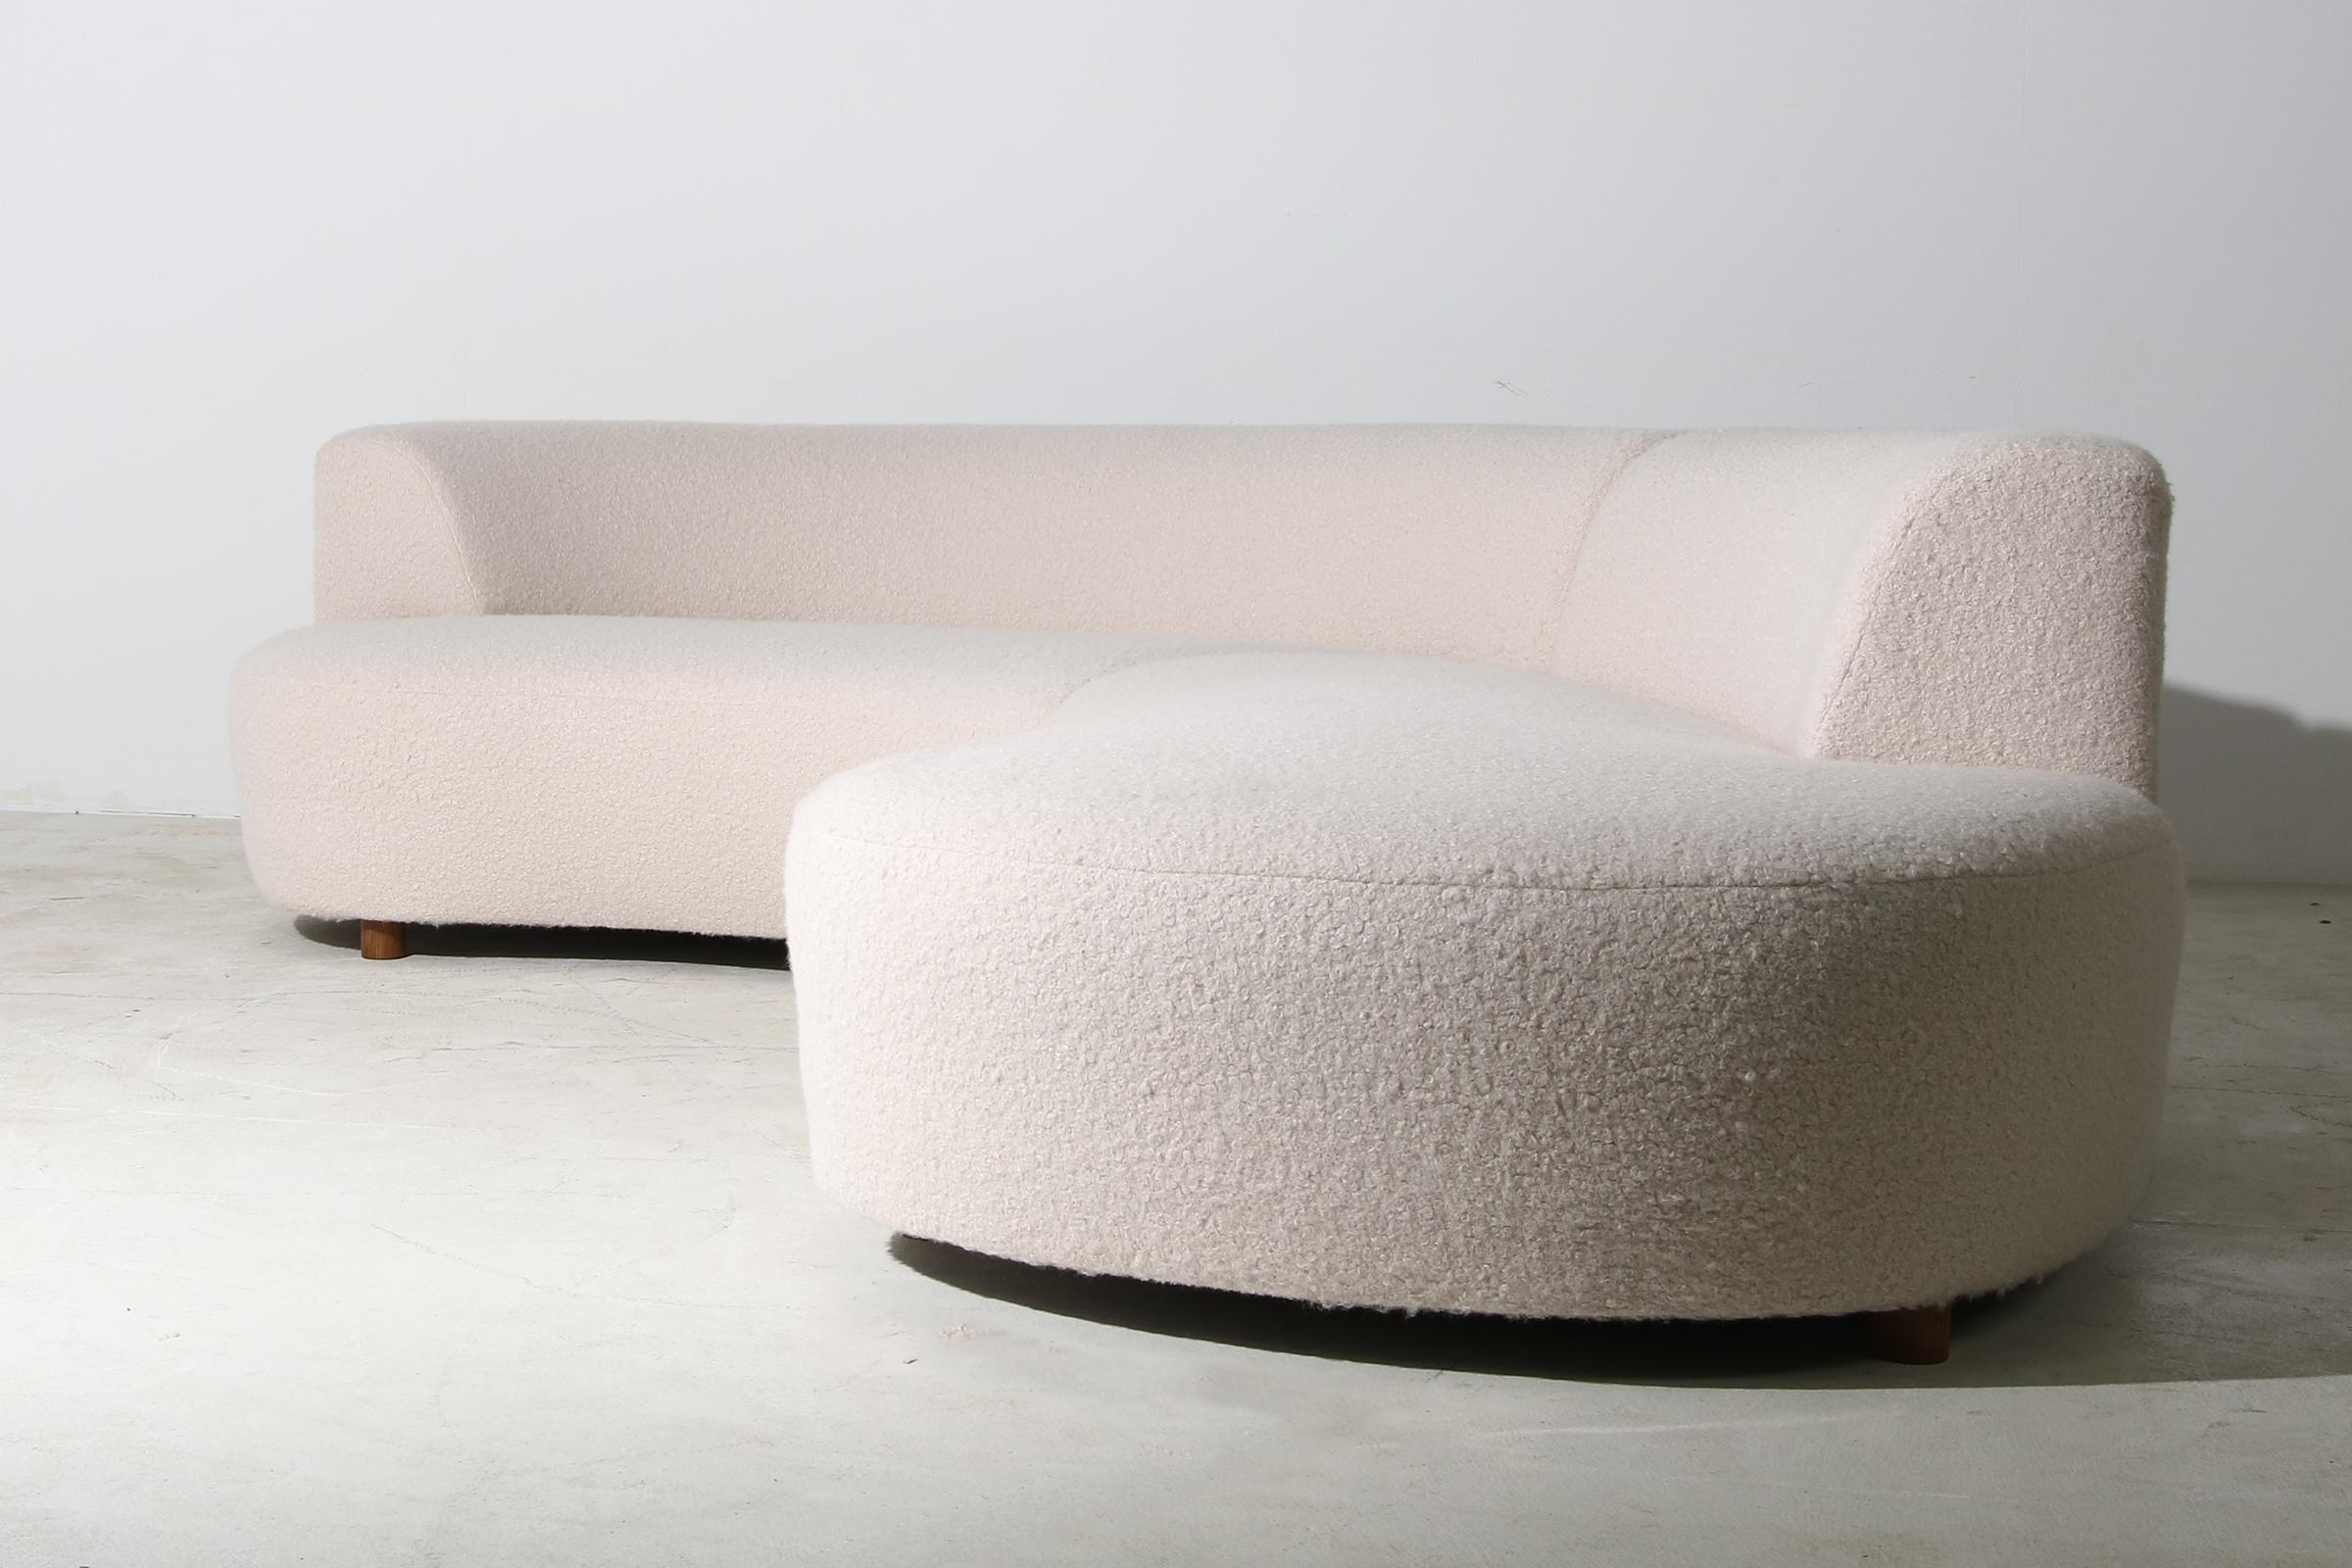 nathan lindberg modular curved sofa with teddy fur boucle and pinewood legs no 2